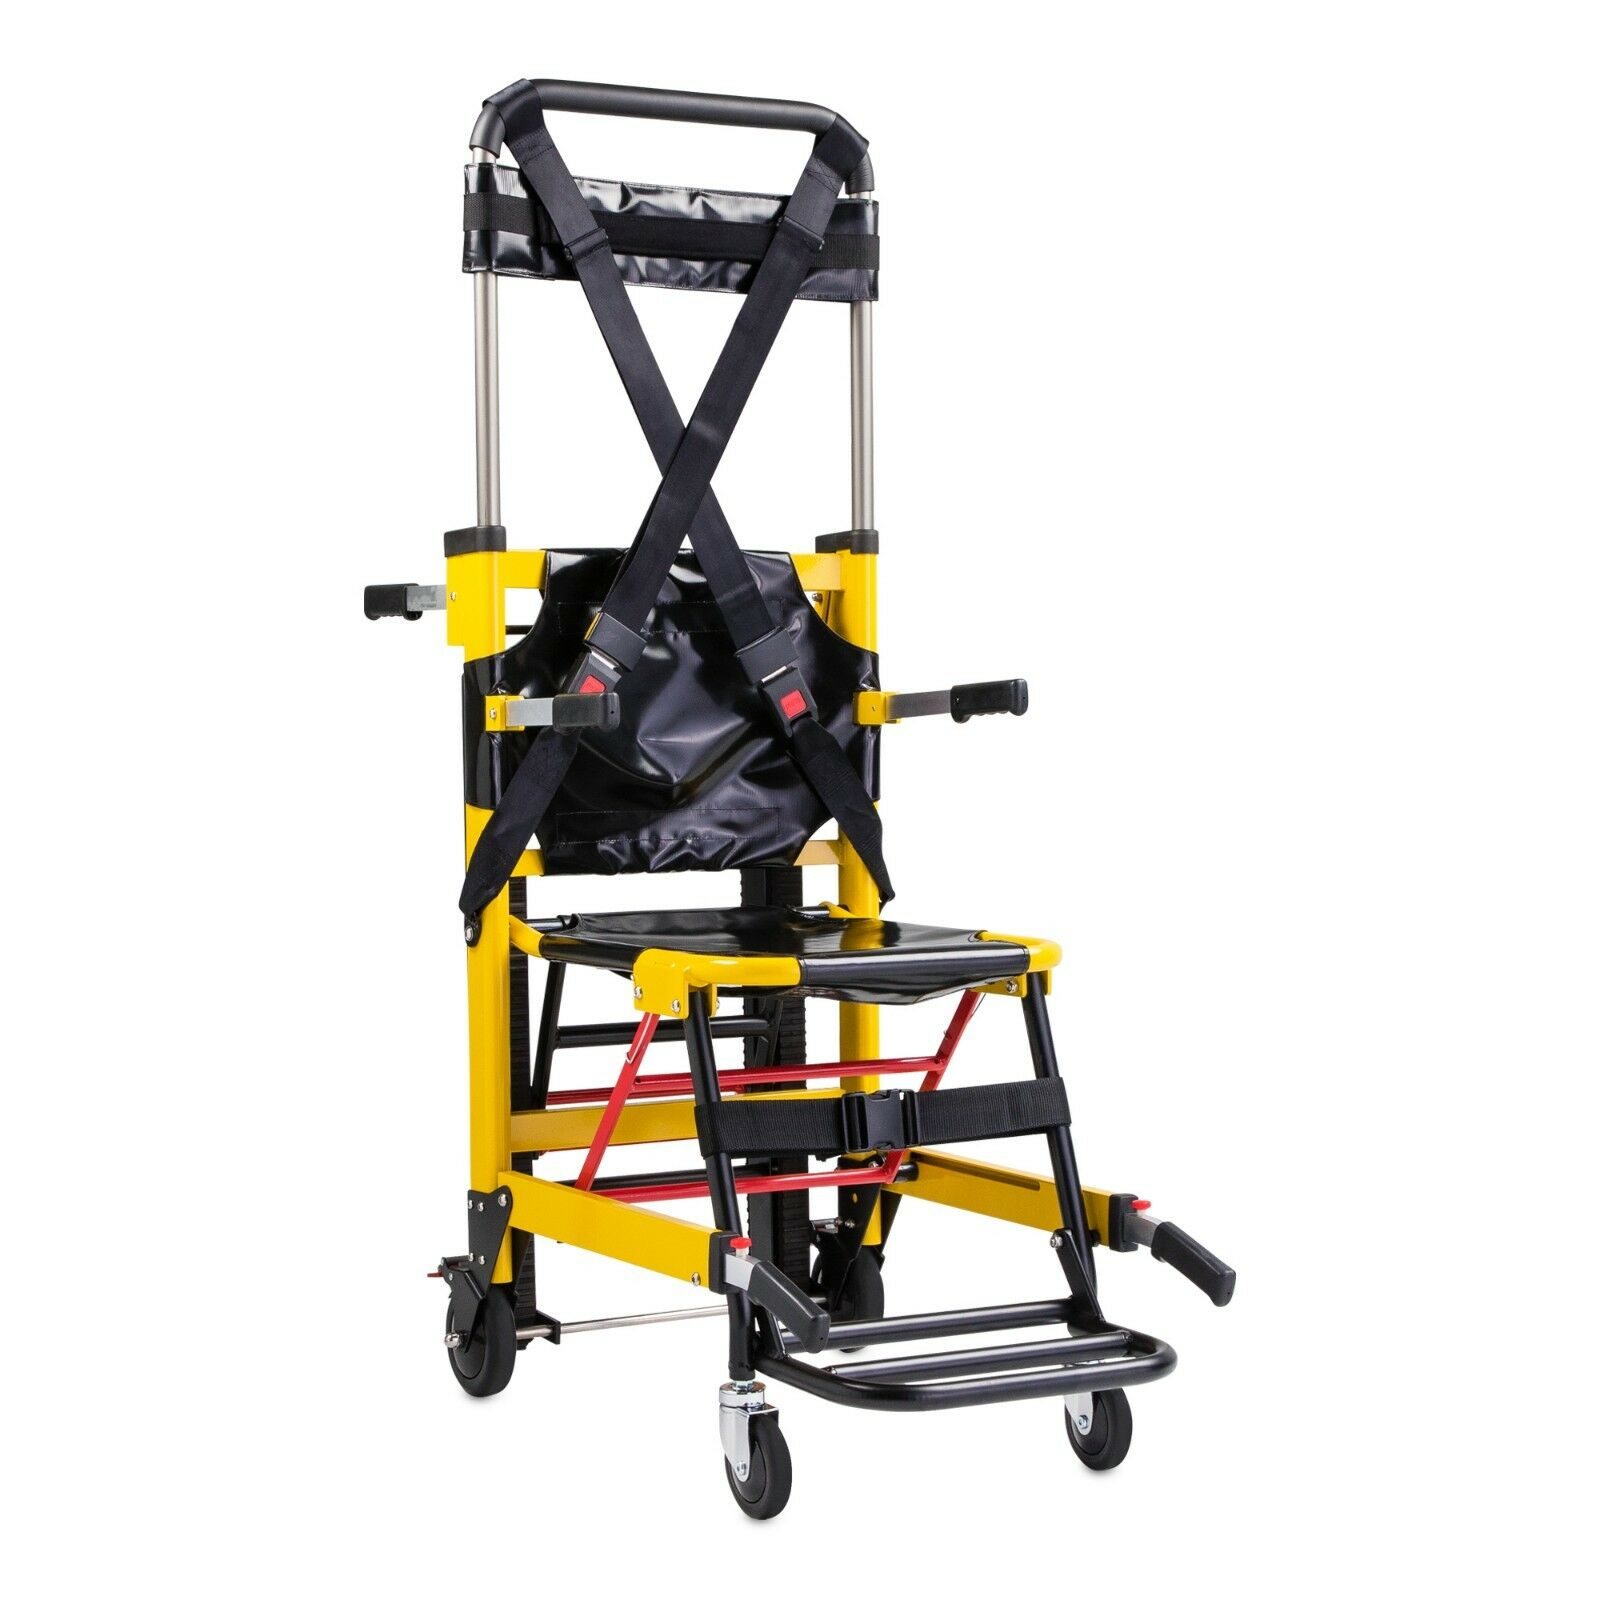 Wheel foldable evacuation stair chair stretcher